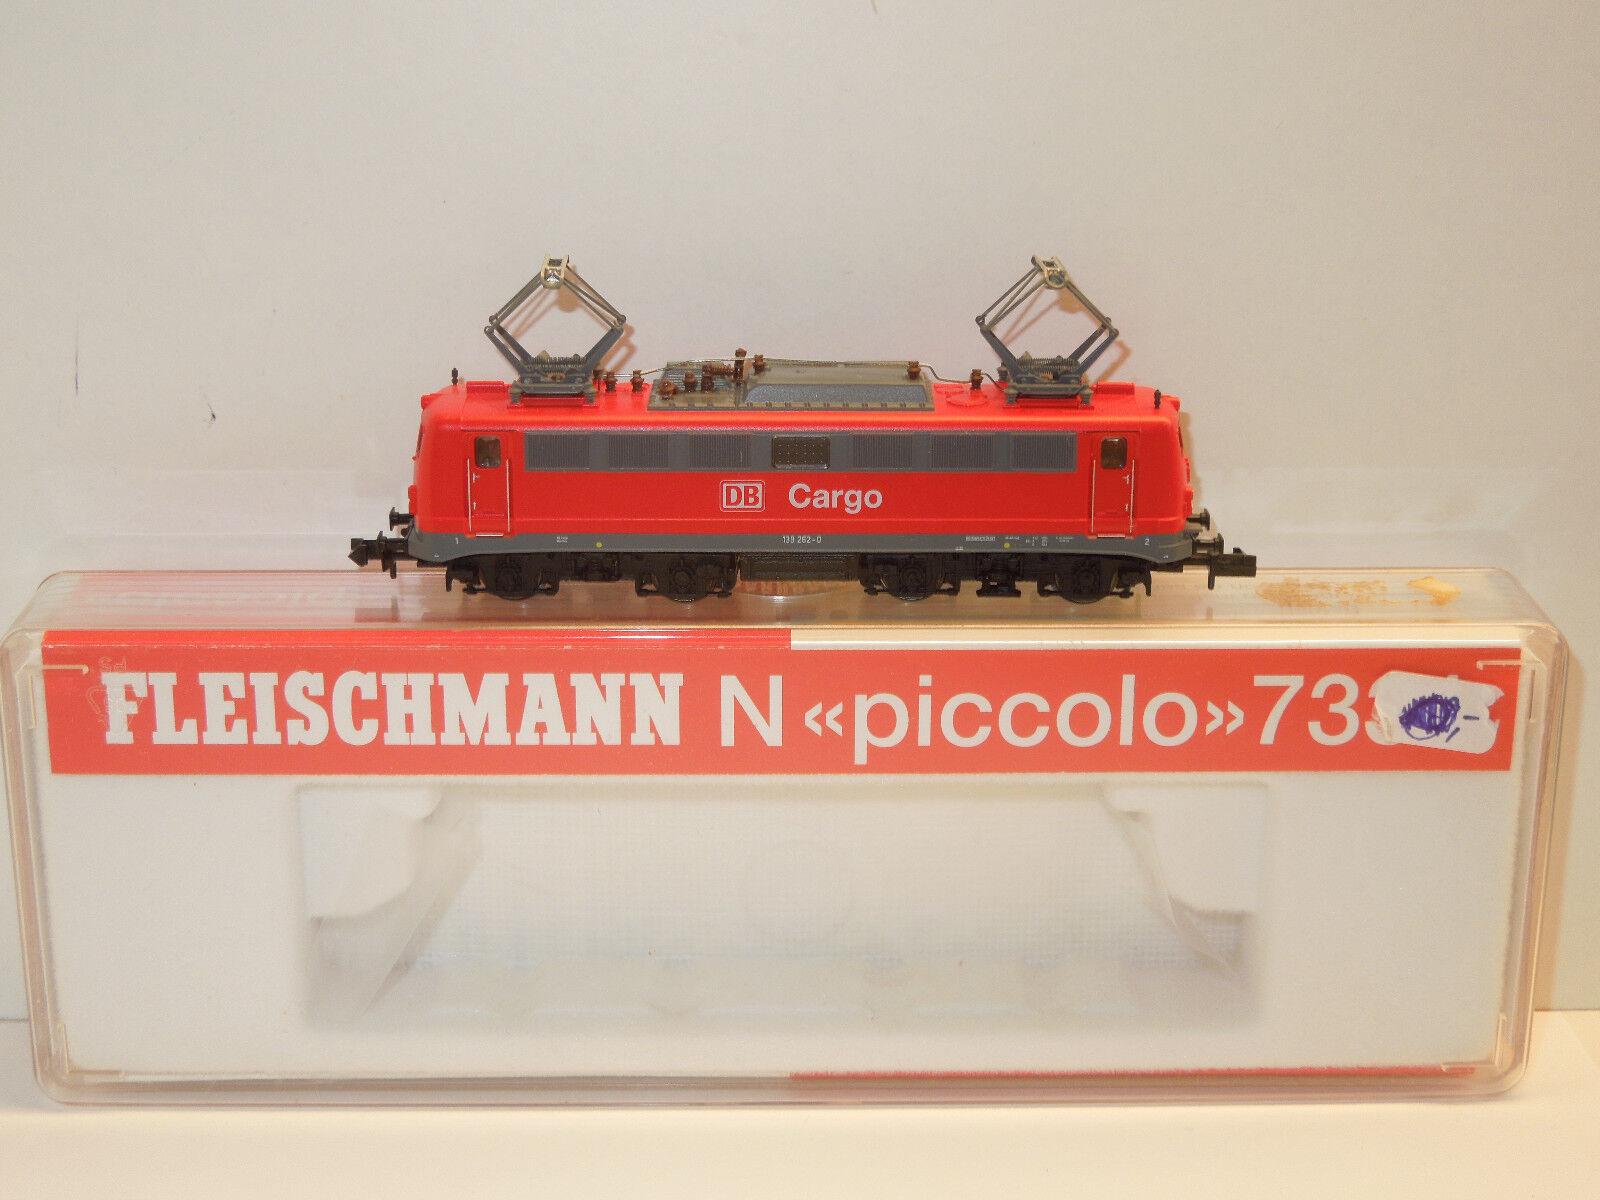 Fleischmann Spur N 7331 E-Lok BR 139 delle DB CARGO